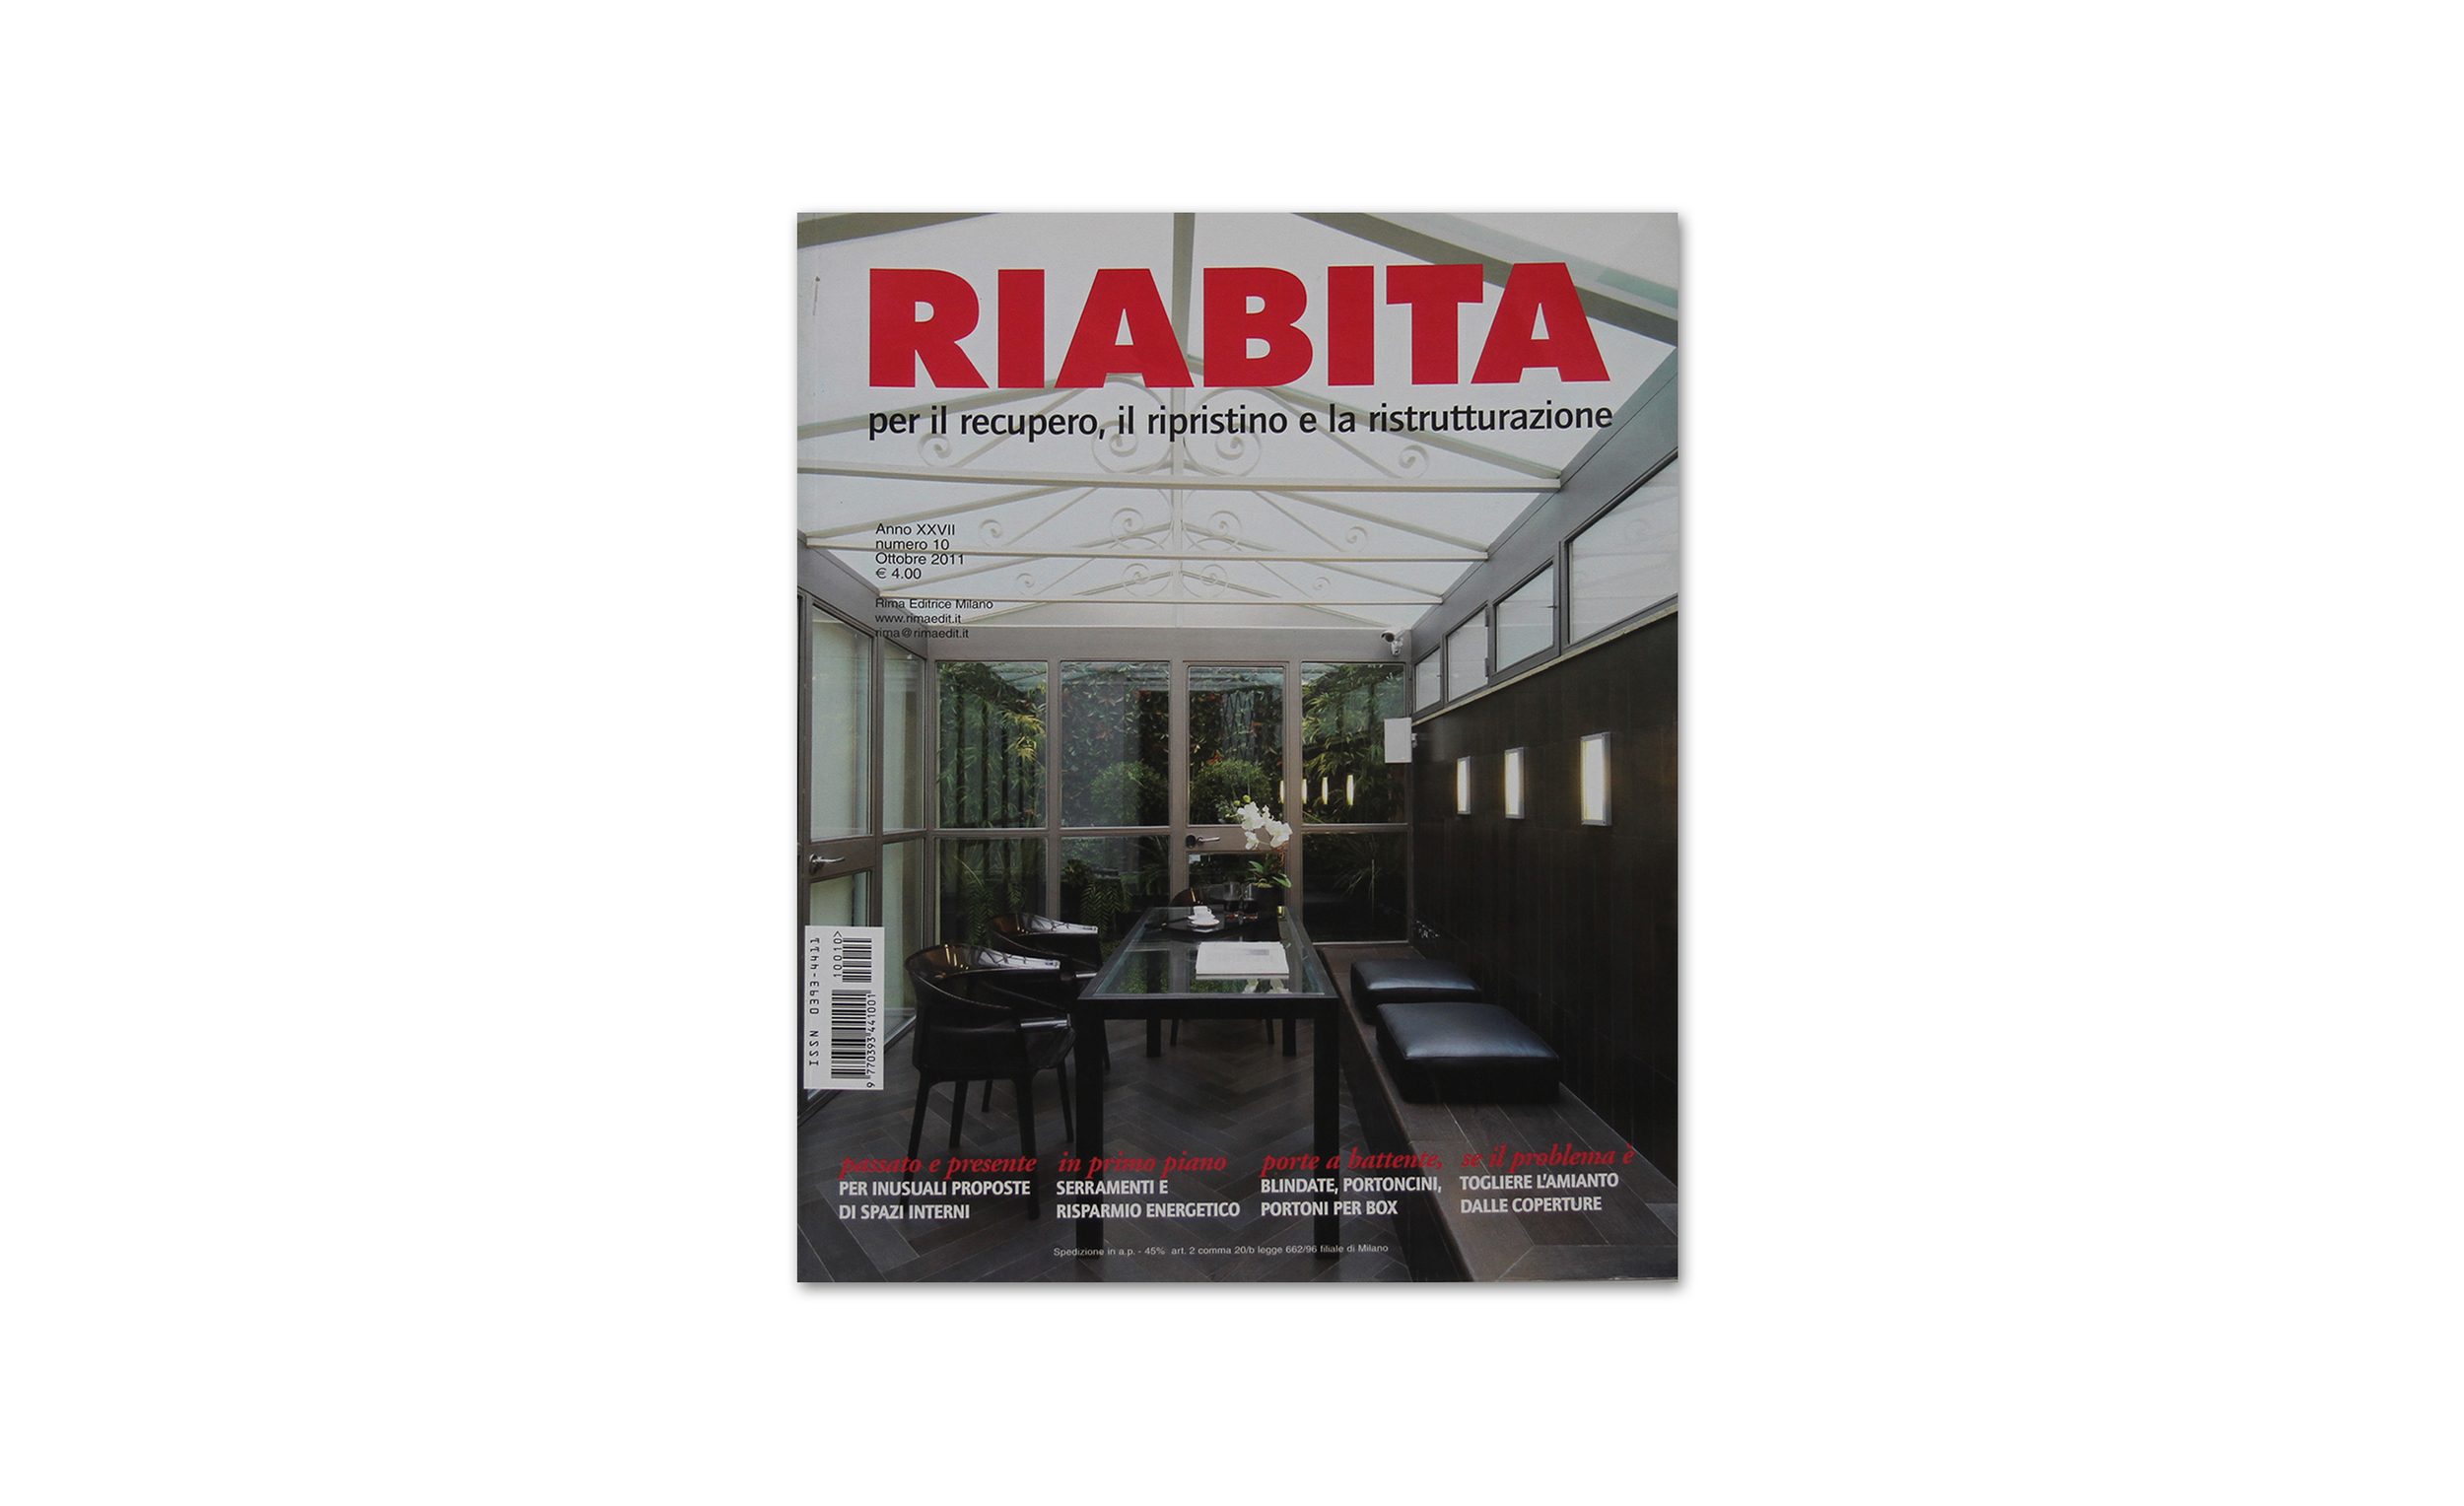 RIABITA 2011 COVER.jpg